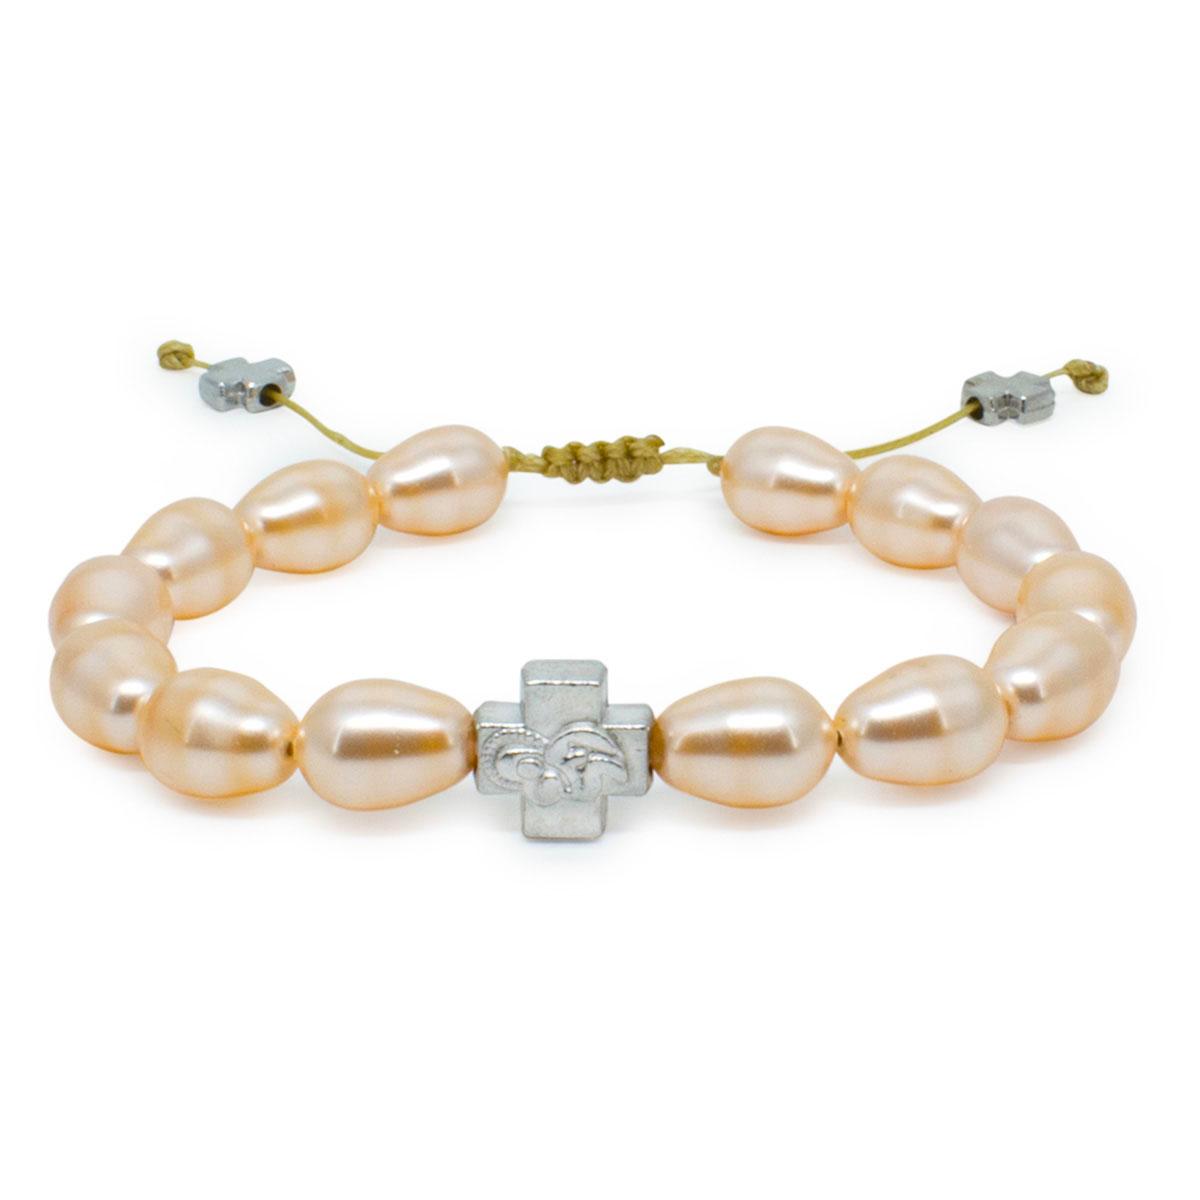 Peach Swarovski Teardrop Pearl Prayer Bracelet 0